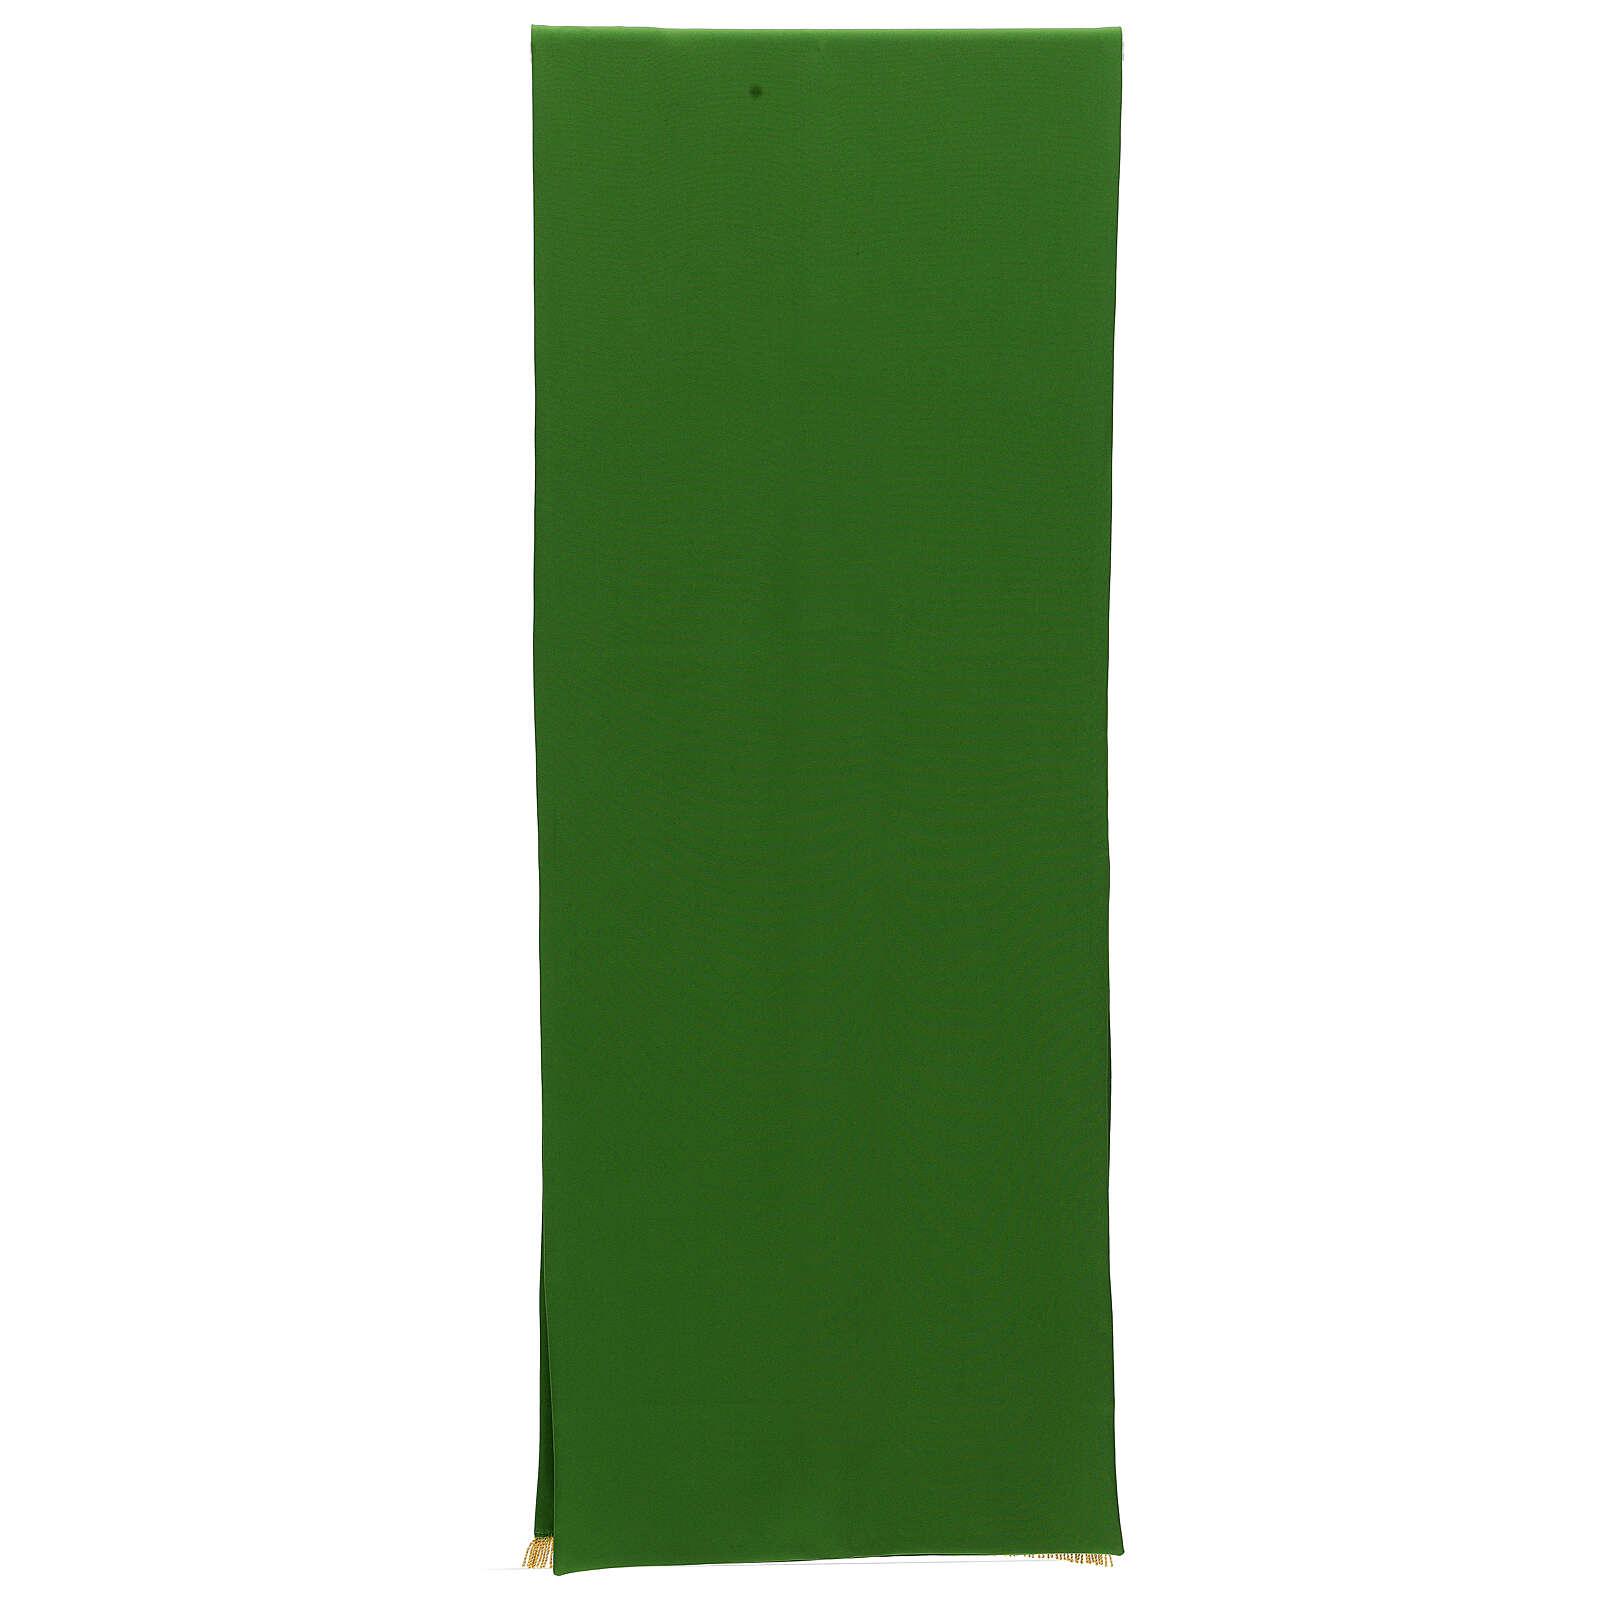 Paño de atril 100% poliéster bordado Tau 4 colores 250x50 4